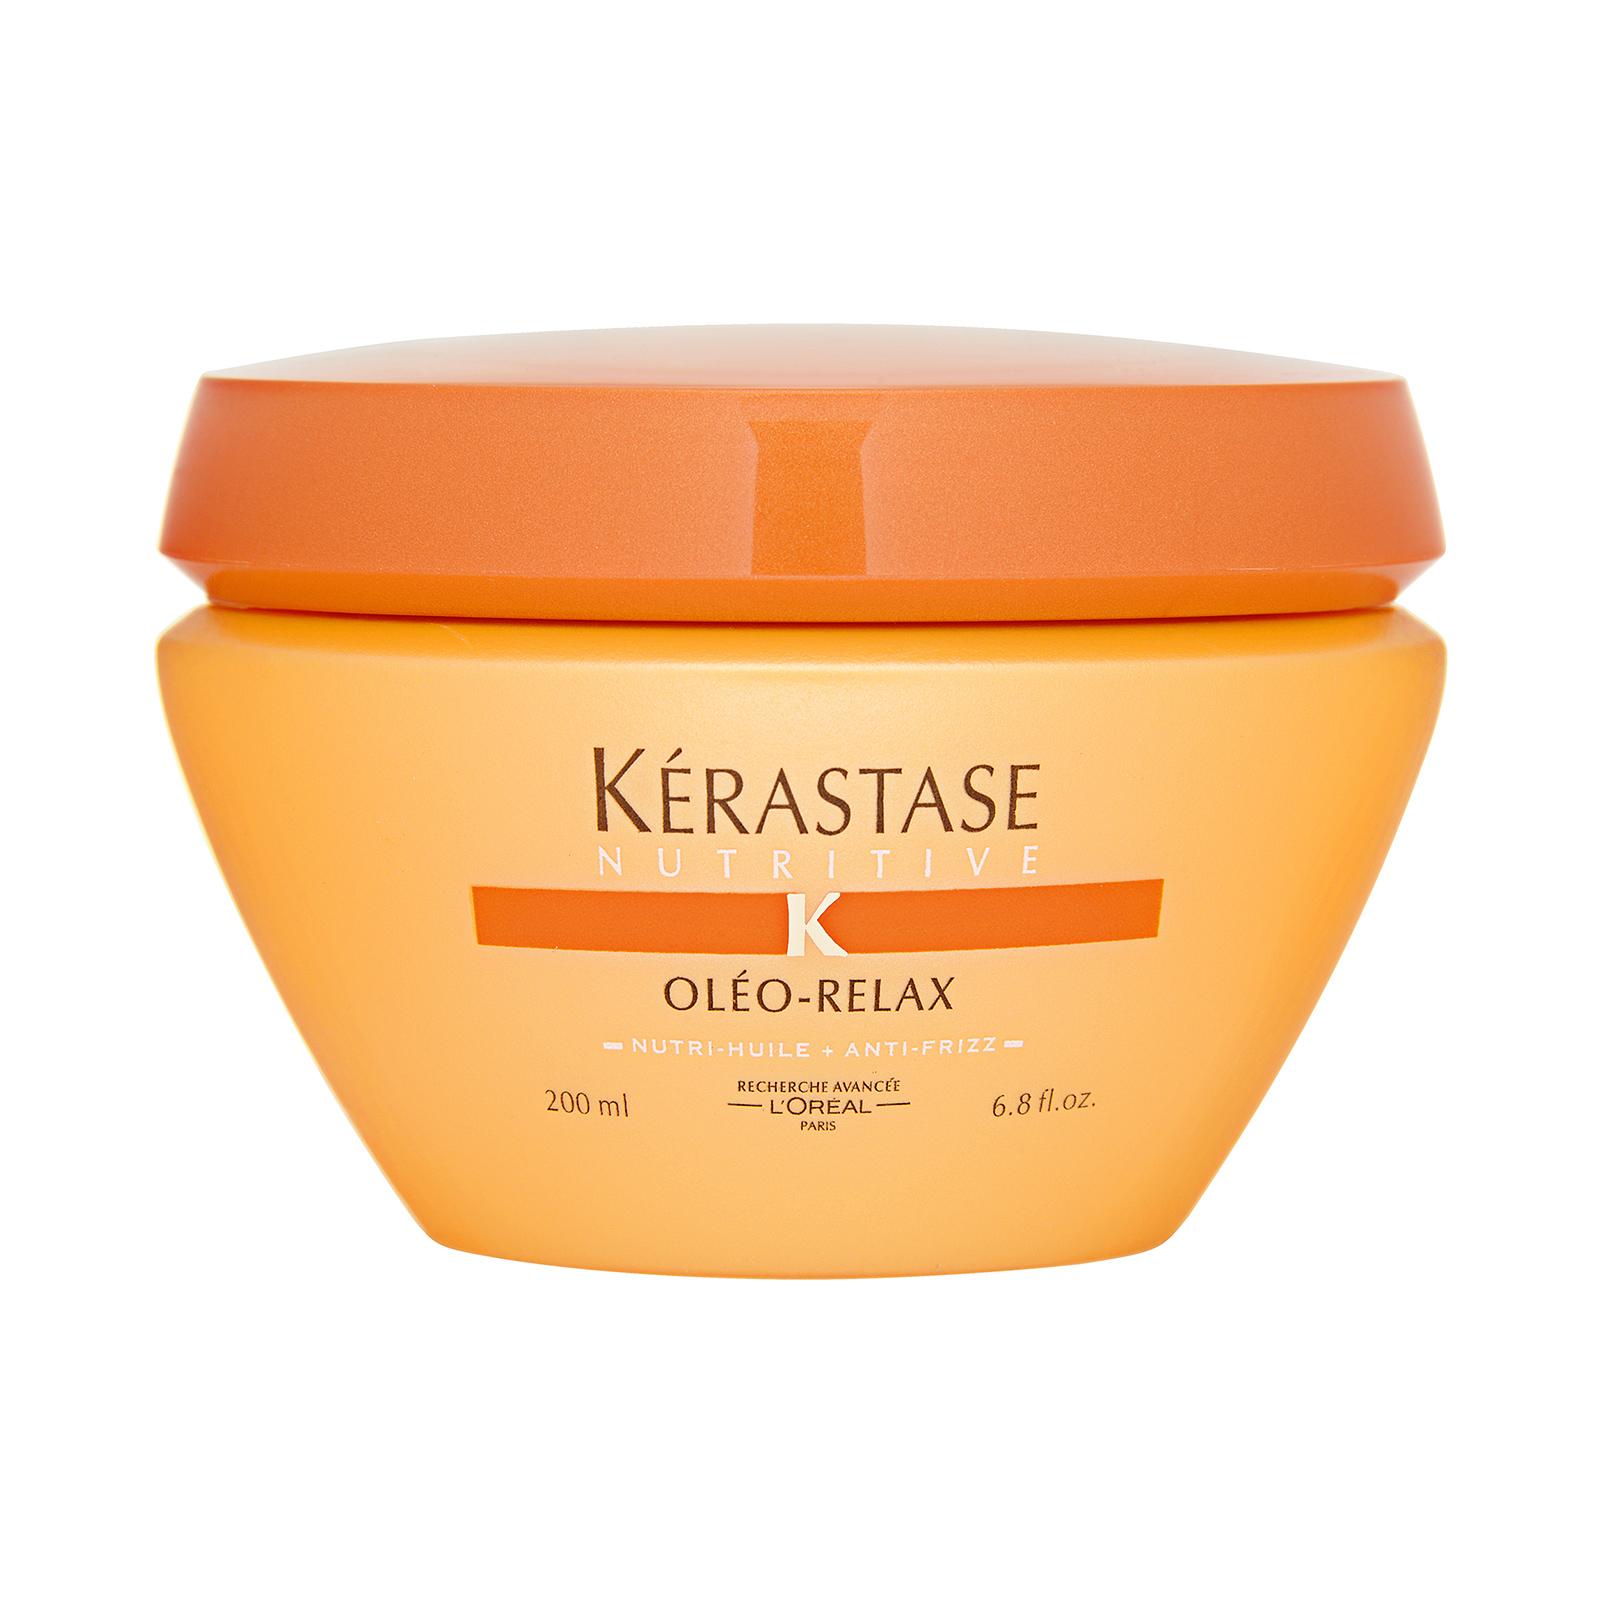 Kérastase Paris Nutritive Oléo-Relax Smoothing Masque (For Dry, Rebellious Hair) 6.8oz, 200ml